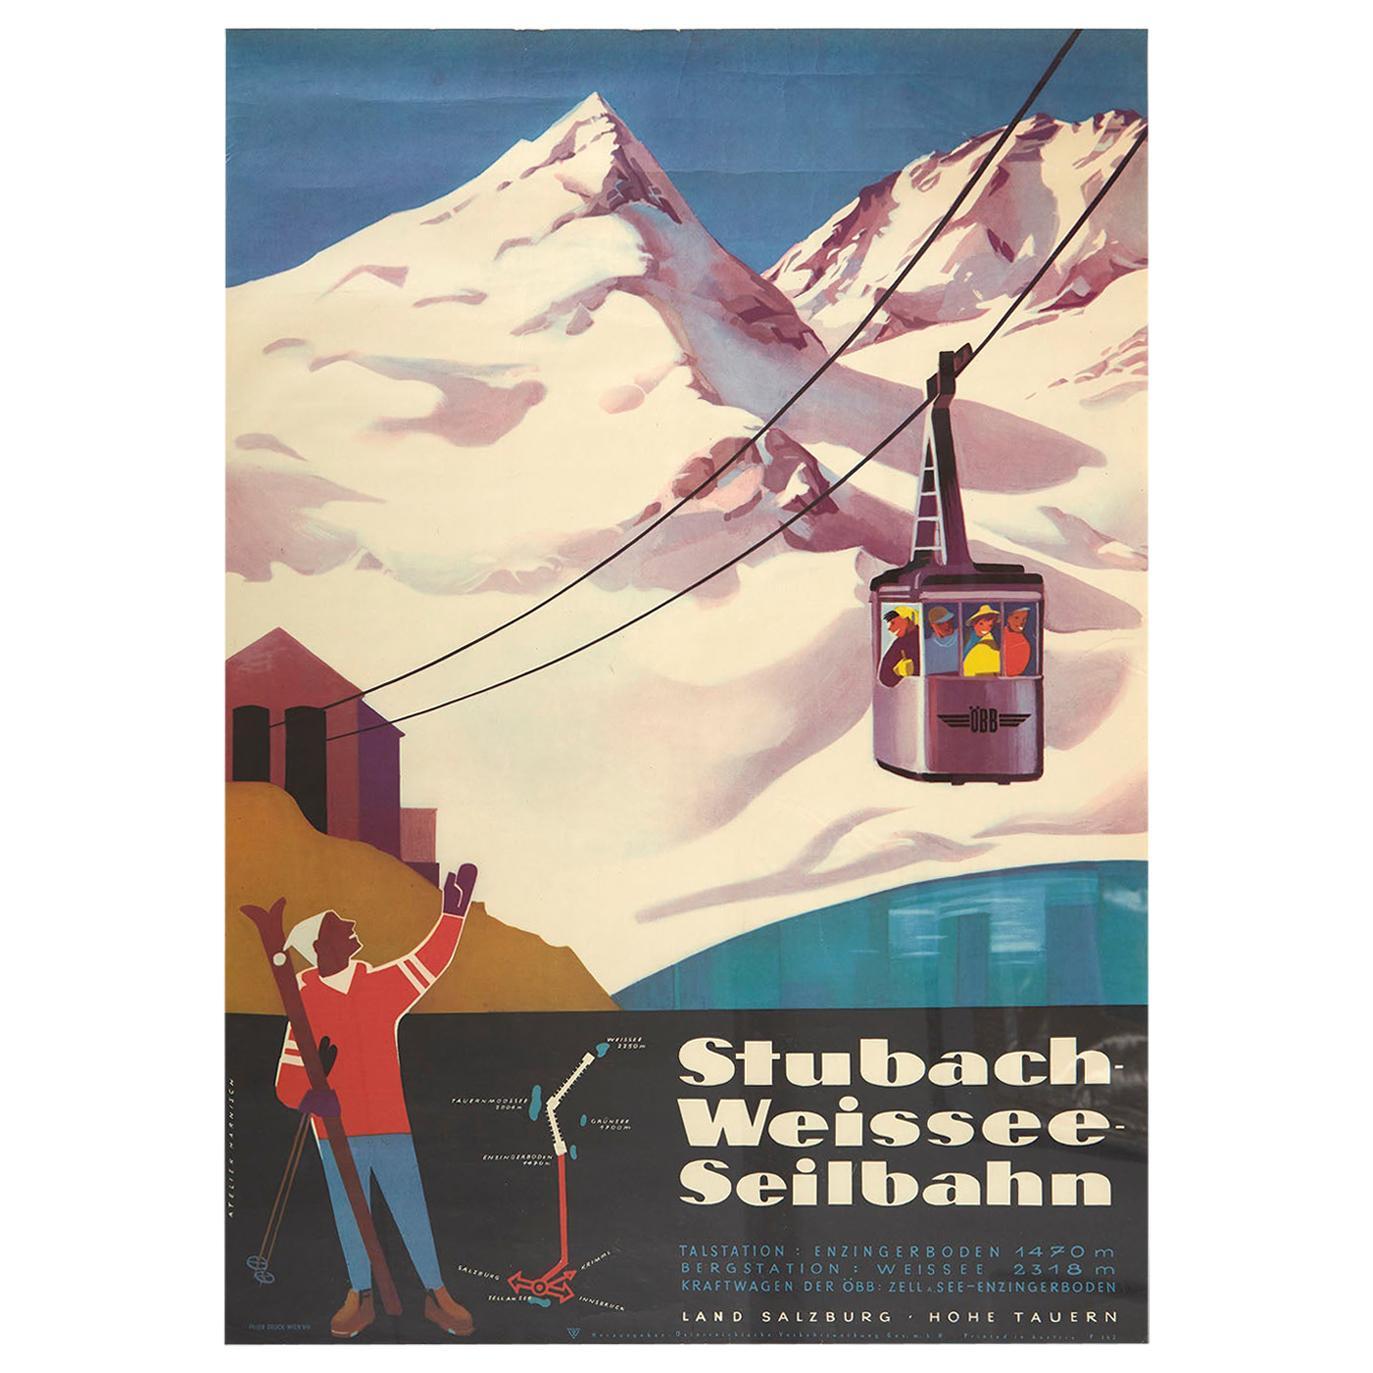 Original Vintage Poster Stubach Weissee Seilbahn Winter Sport Skiing Travel Art